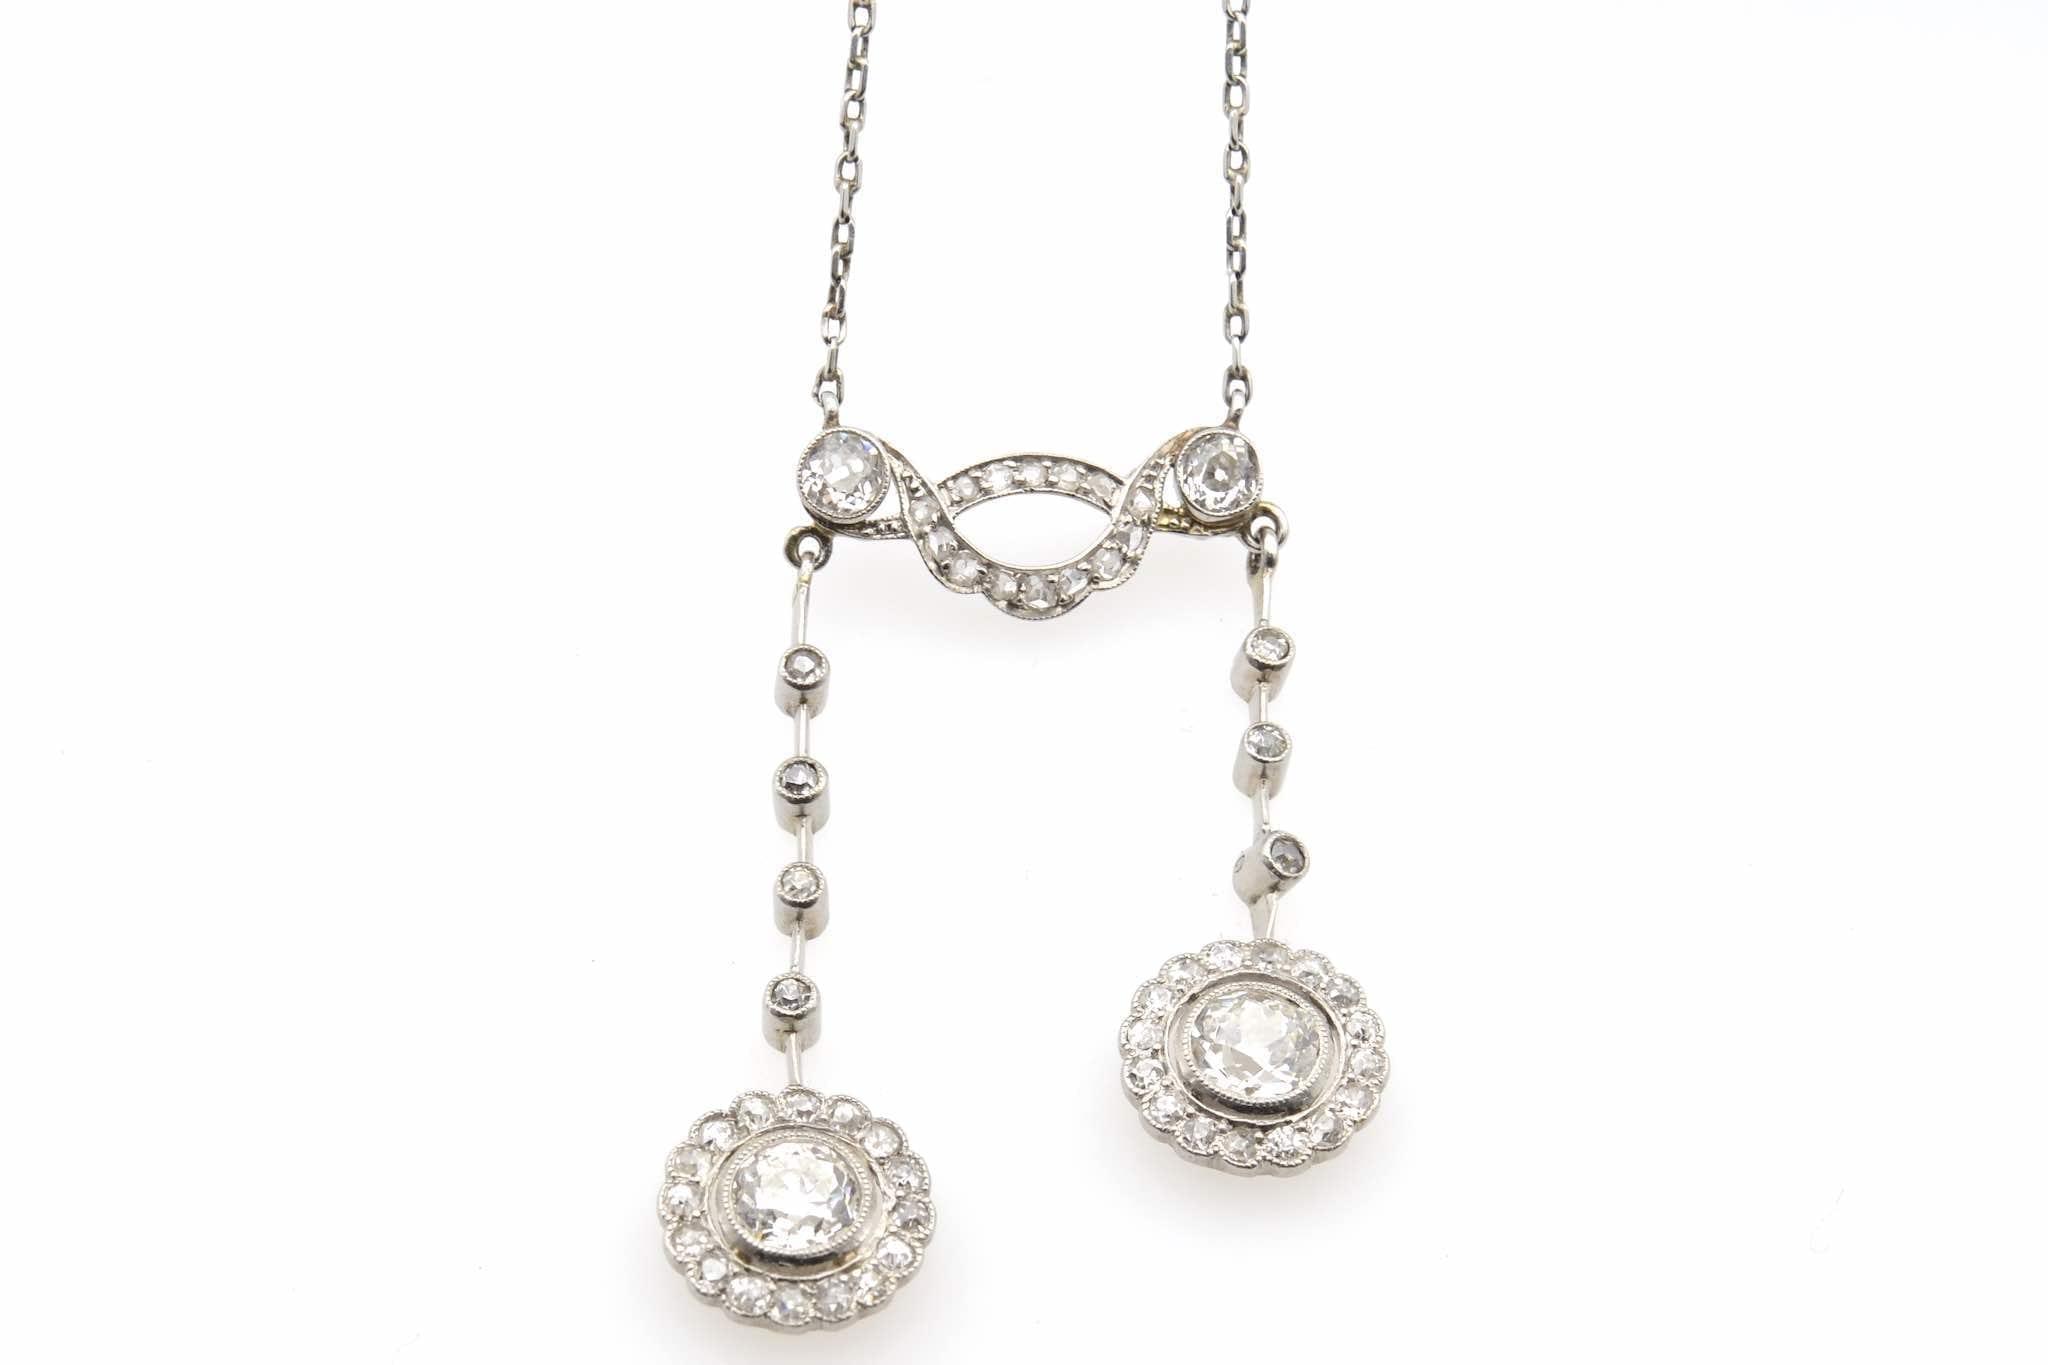 rachat de colliers or blanc 18k diamants